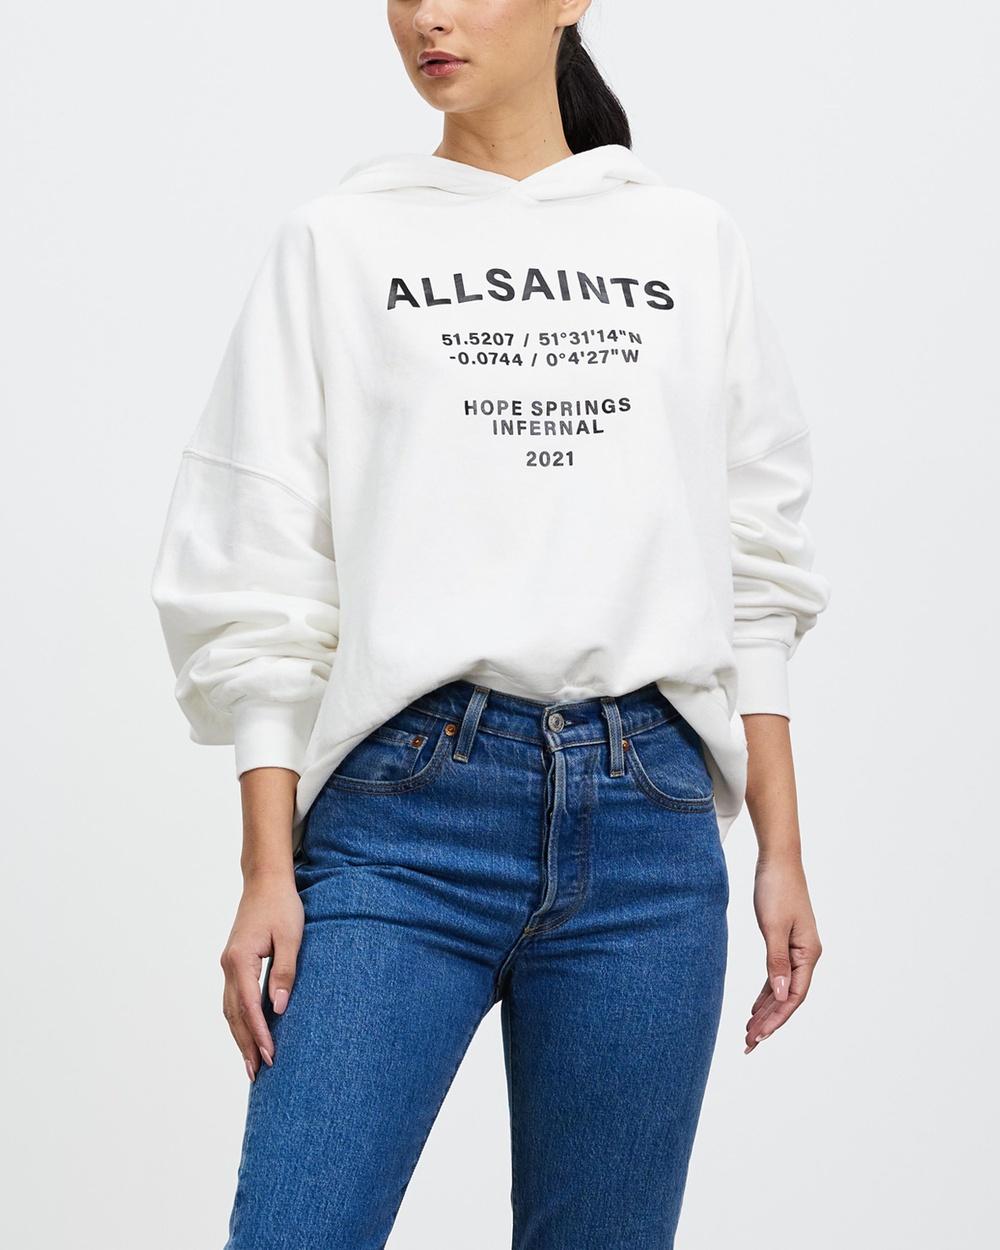 AllSaints Co Ordinates Talie Hoodie Hoodies Optic White Co-Ordinates